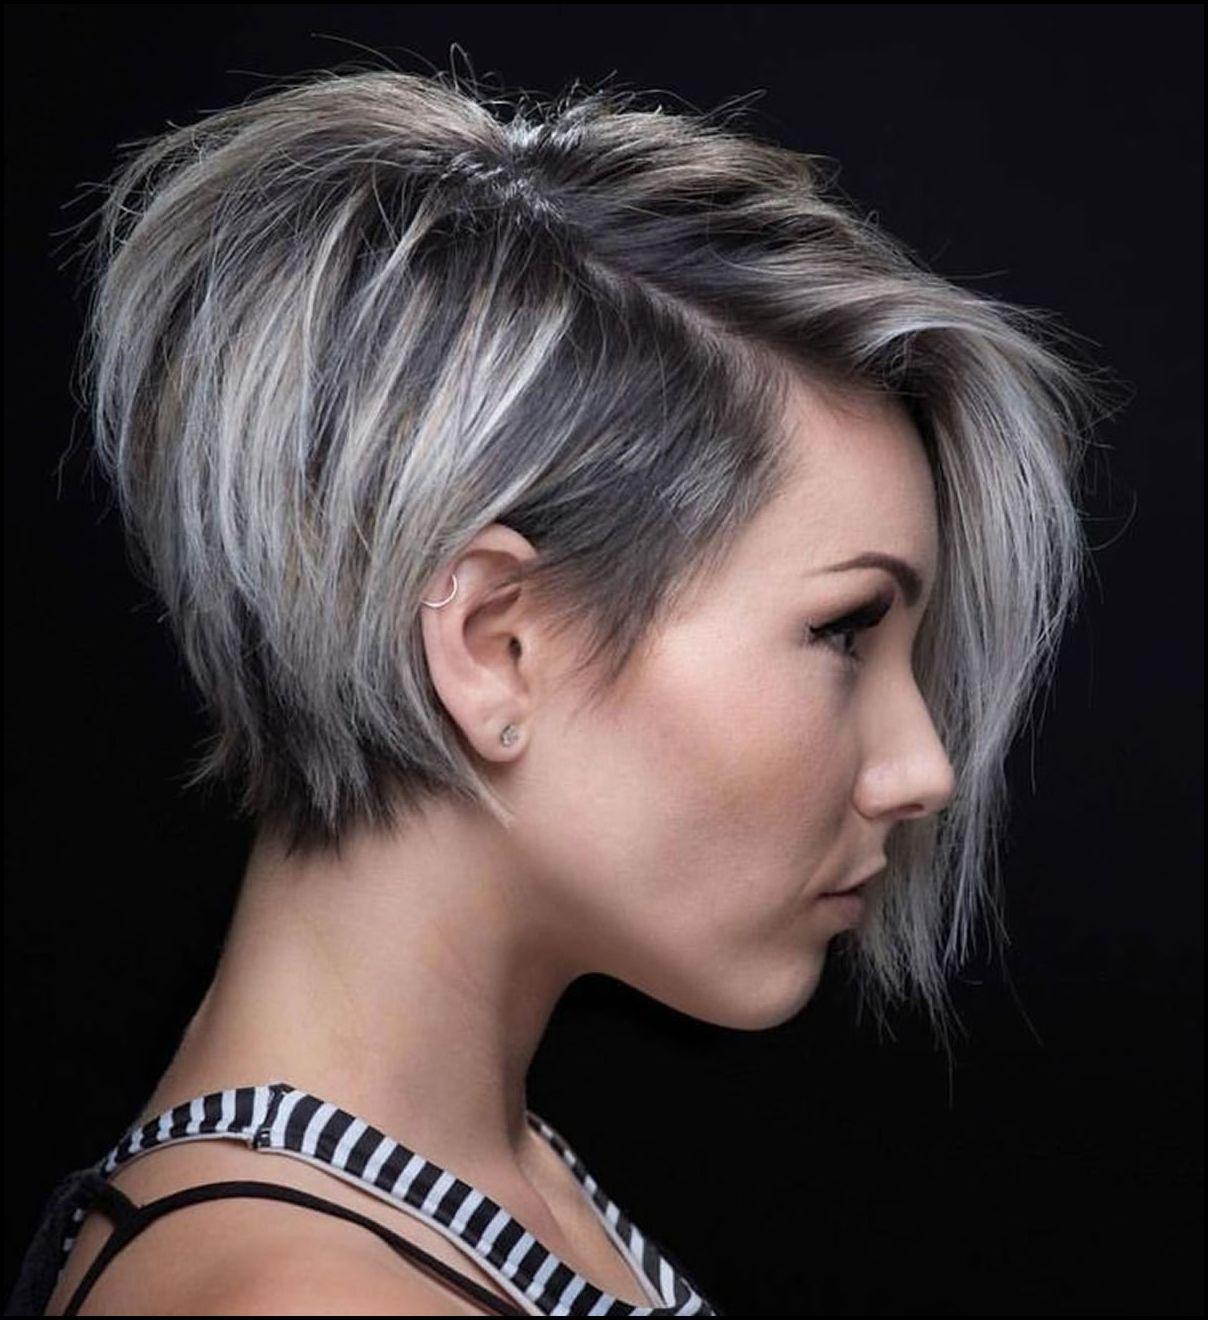 30 Best Asymmetric Short Haircuts for Women of All Time #Frisuren #HairStyles  30… | Short hairstyles for thick hair, Thick hair styles, Pixie haircut for  thick hair